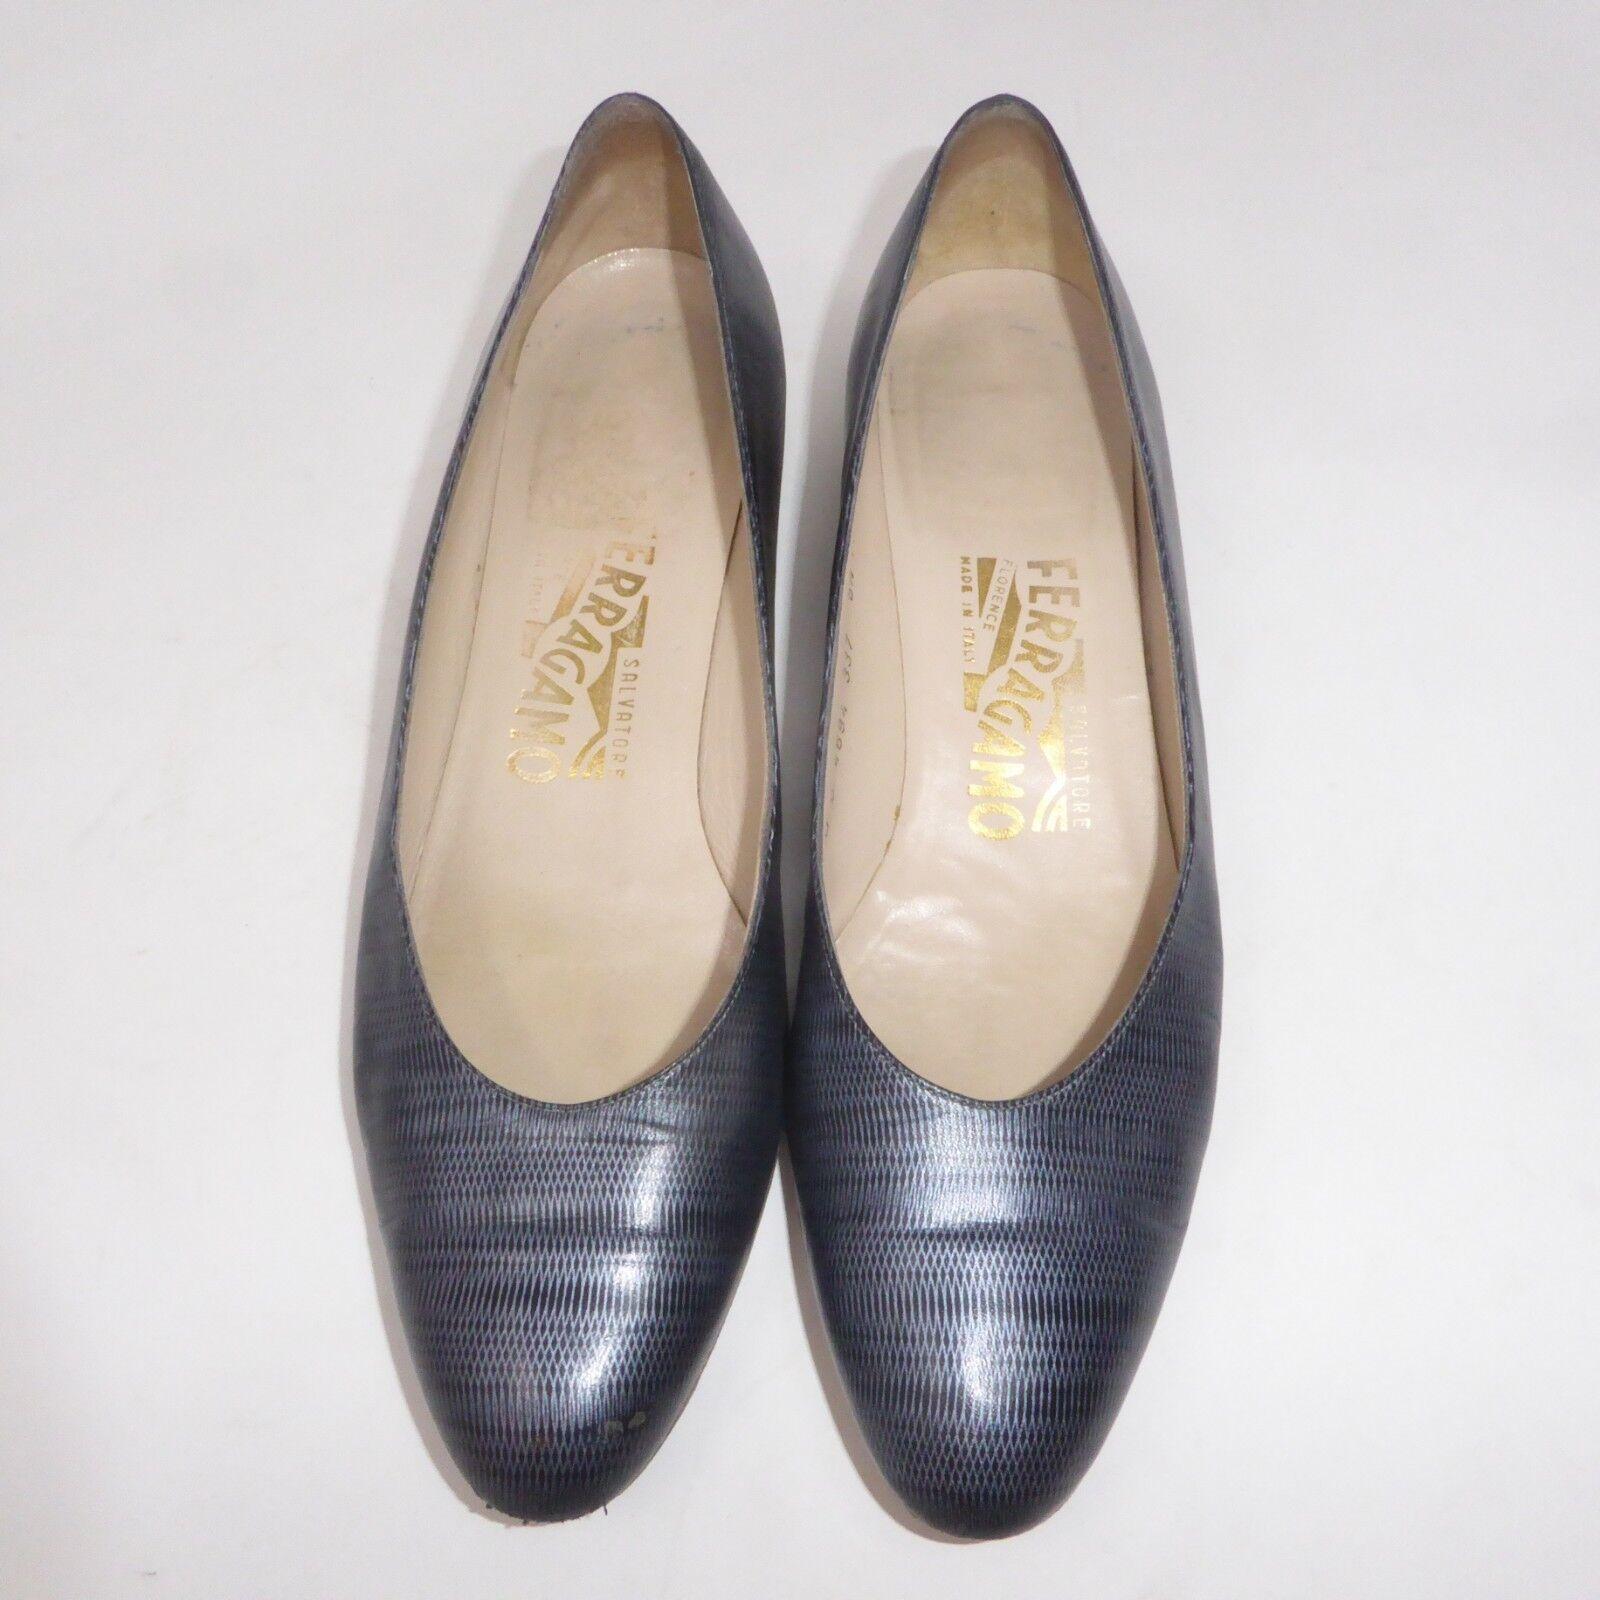 Salvatore Ferragamo Florence Sz 8.5 AA Heels Pumps bluee shoes Made  Narrow